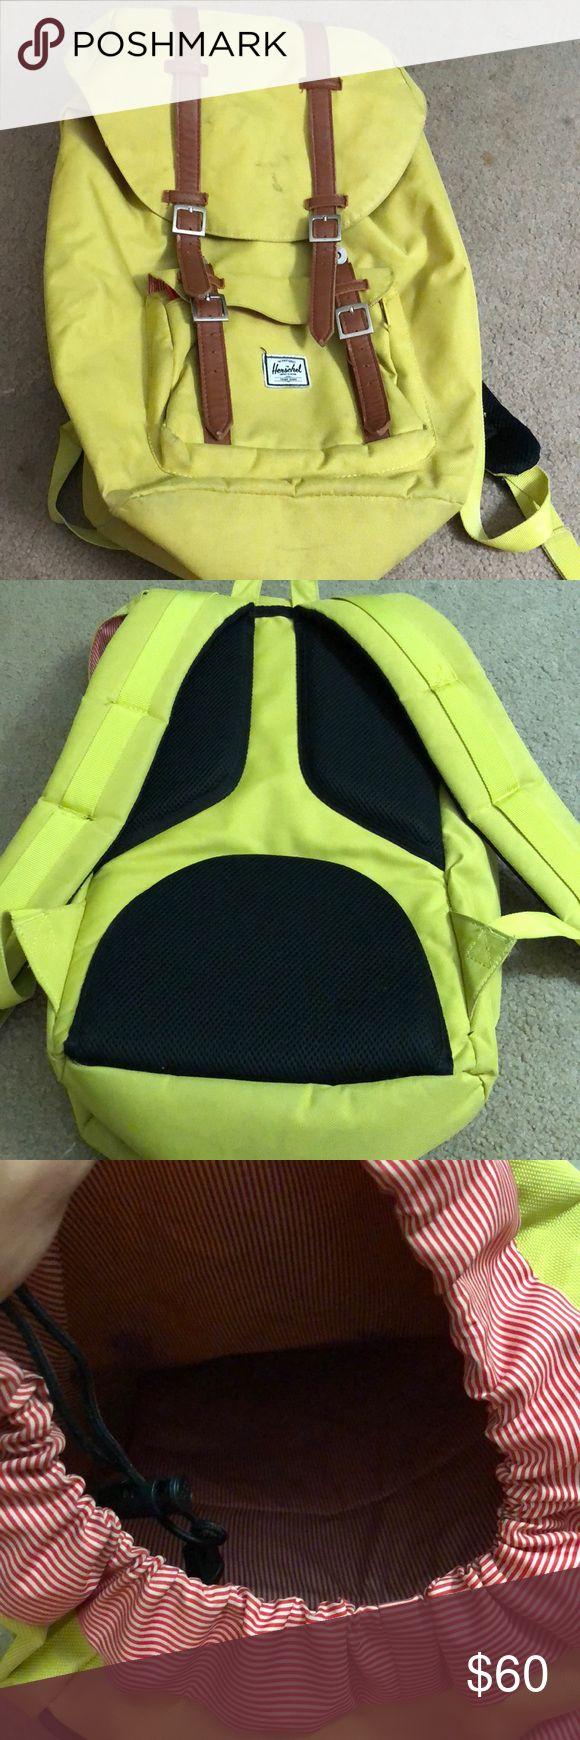 Herschel backpack Used Herschel bag. Nothing wrong with it. Herschel Supply Company Bags Backpacks